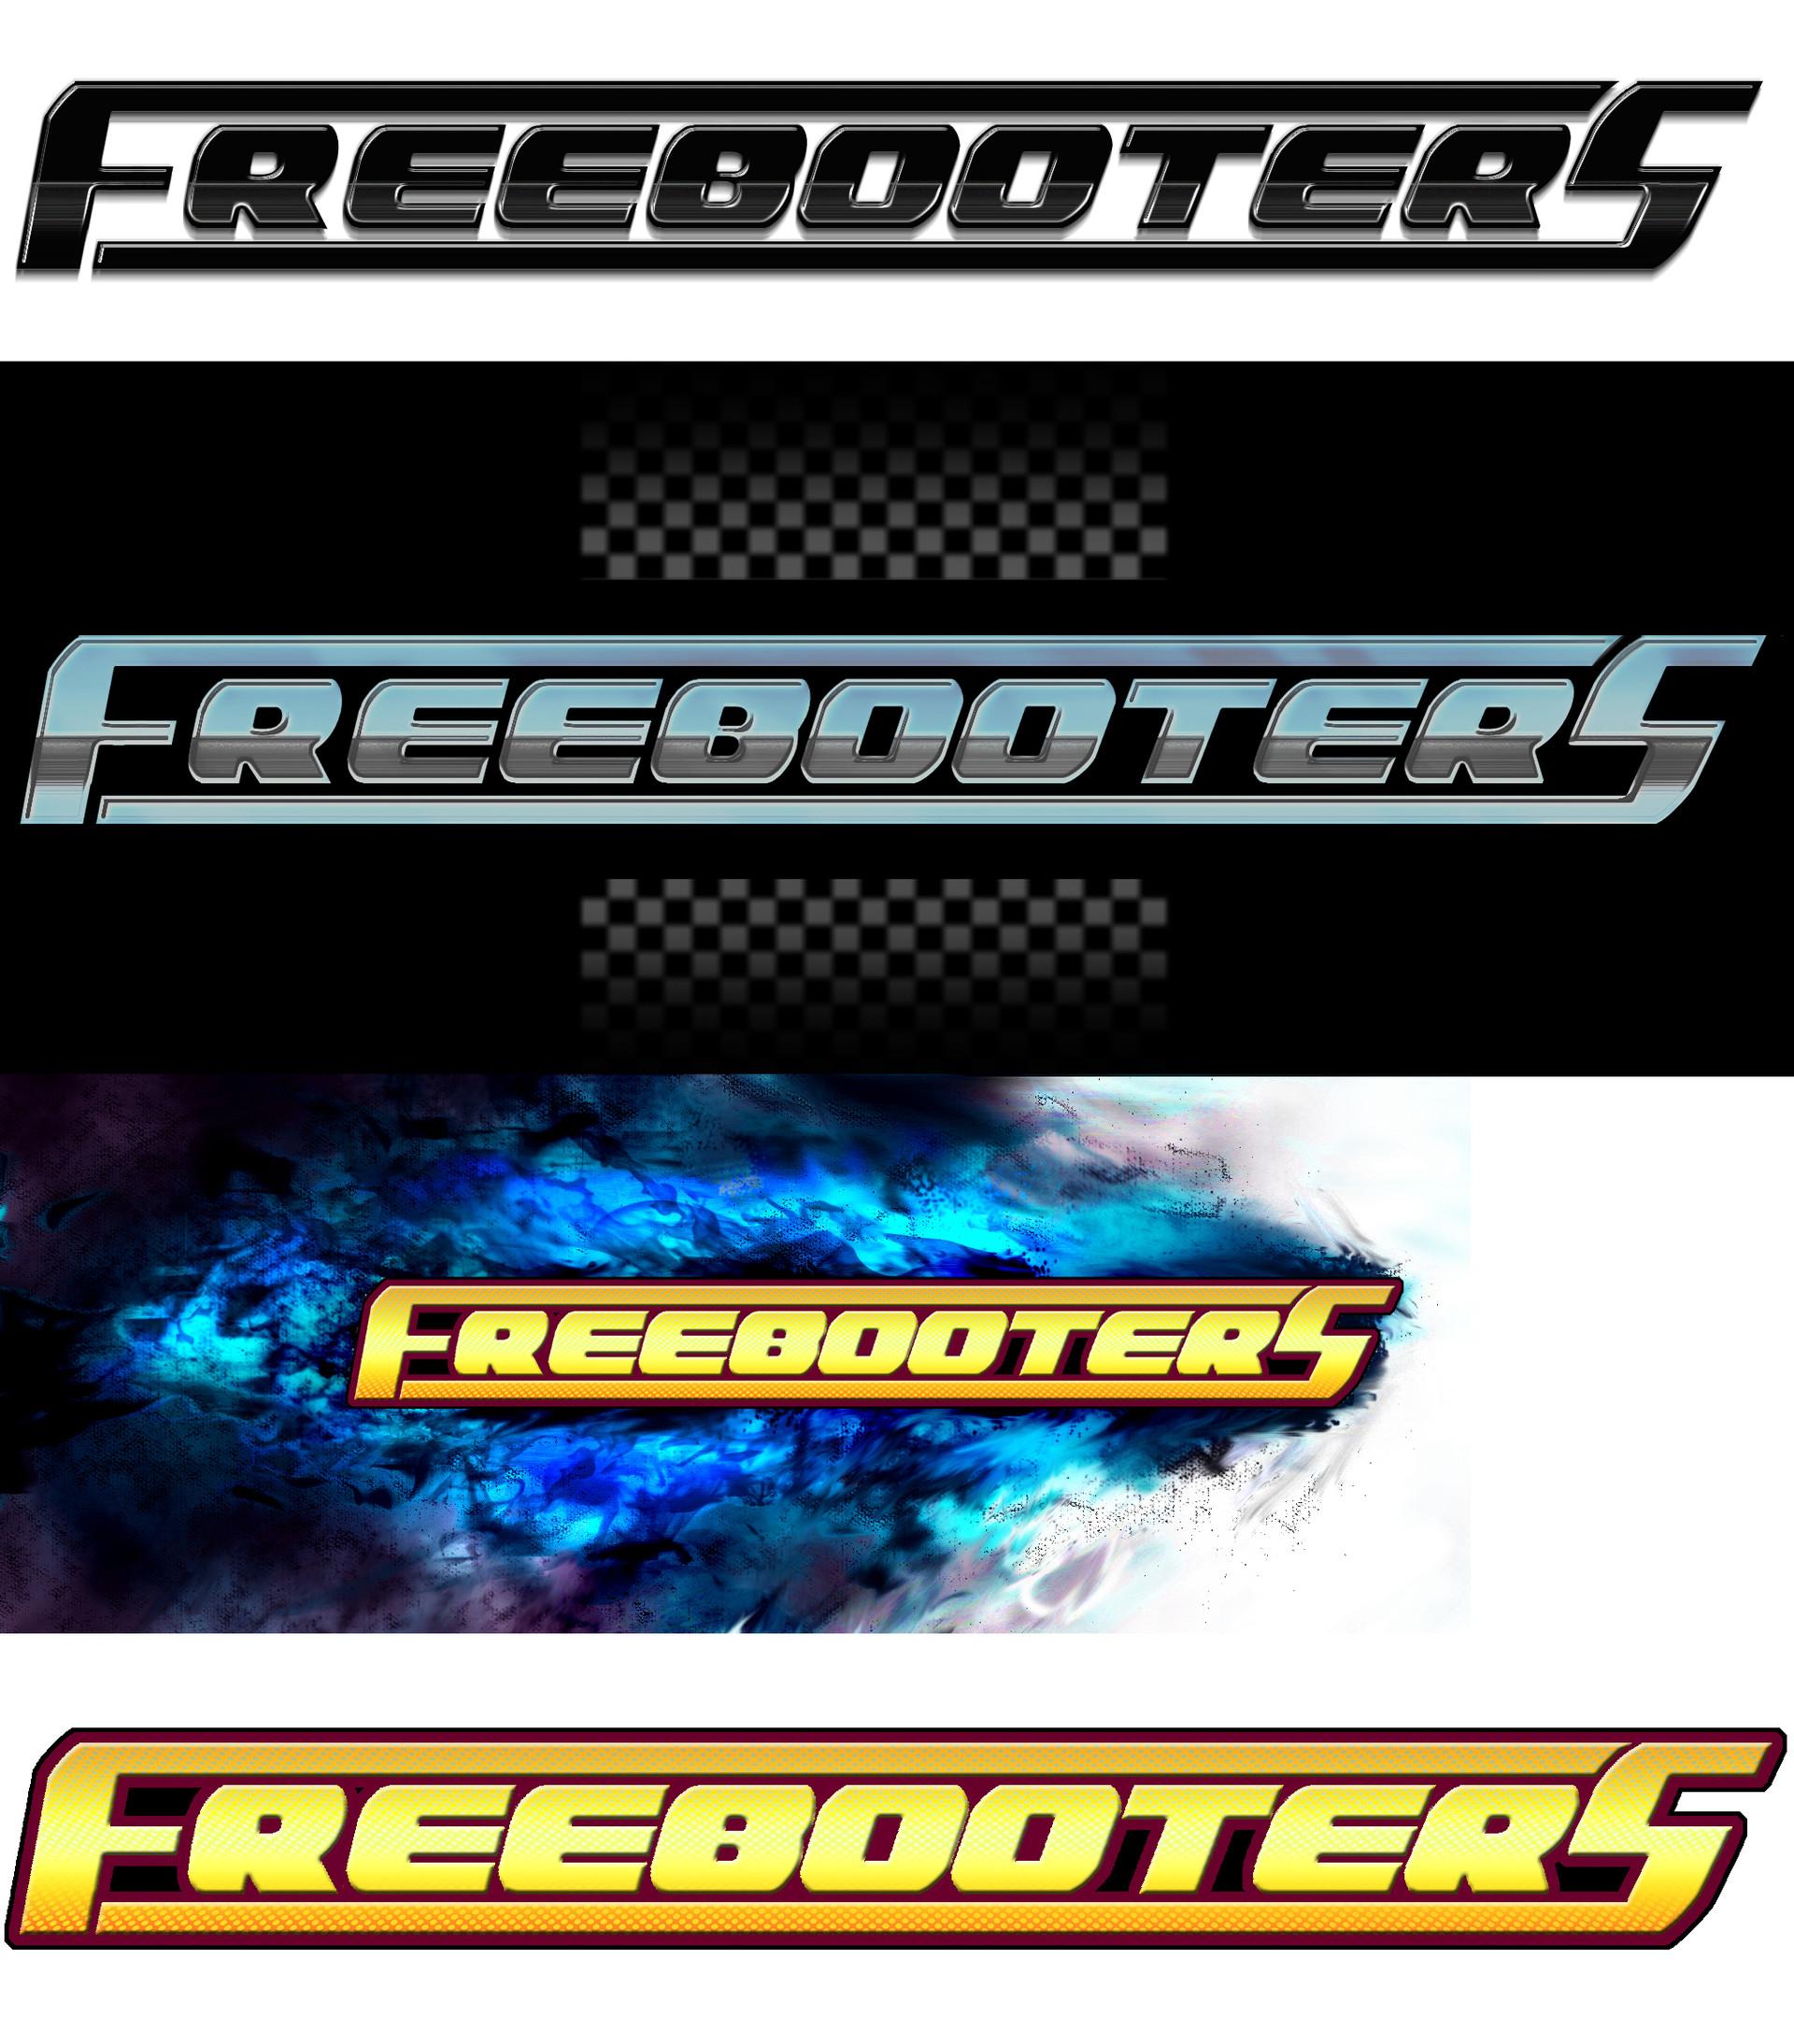 Michael jenkins freebooter logo variatons